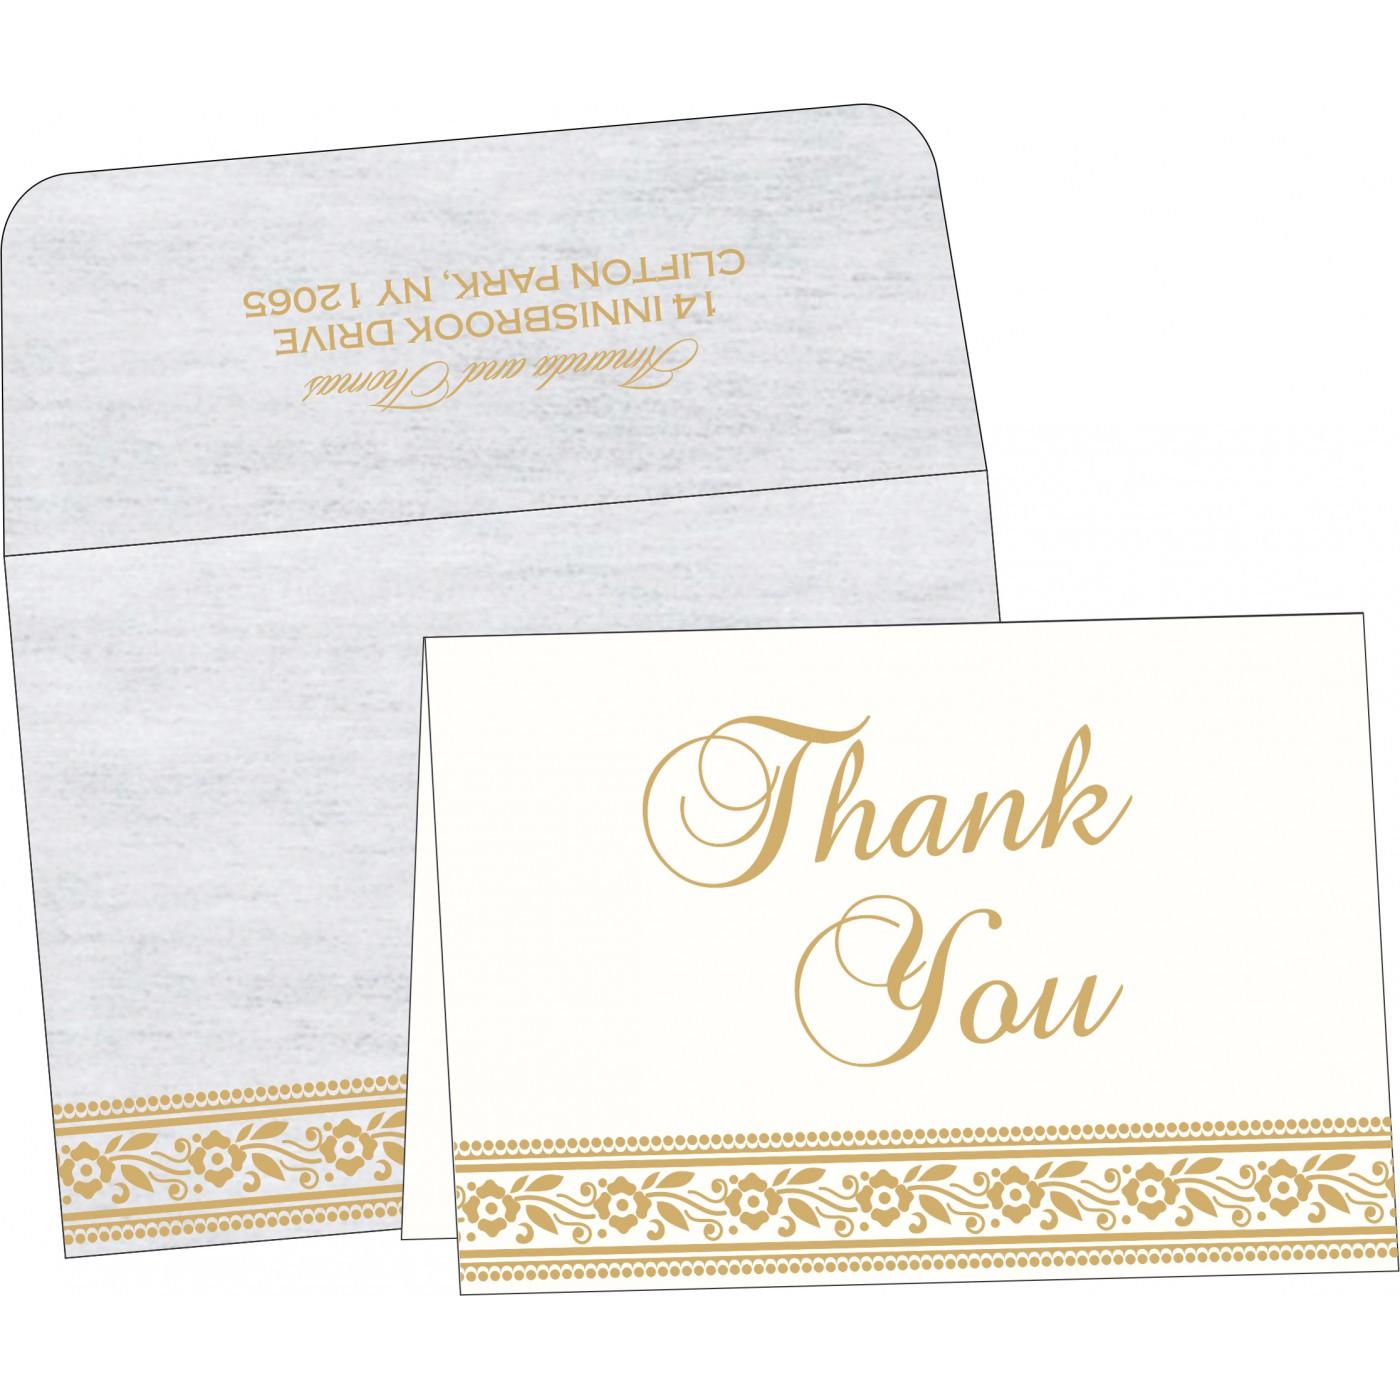 Thank You Cards : TYC-8220D - 123WeddingCards